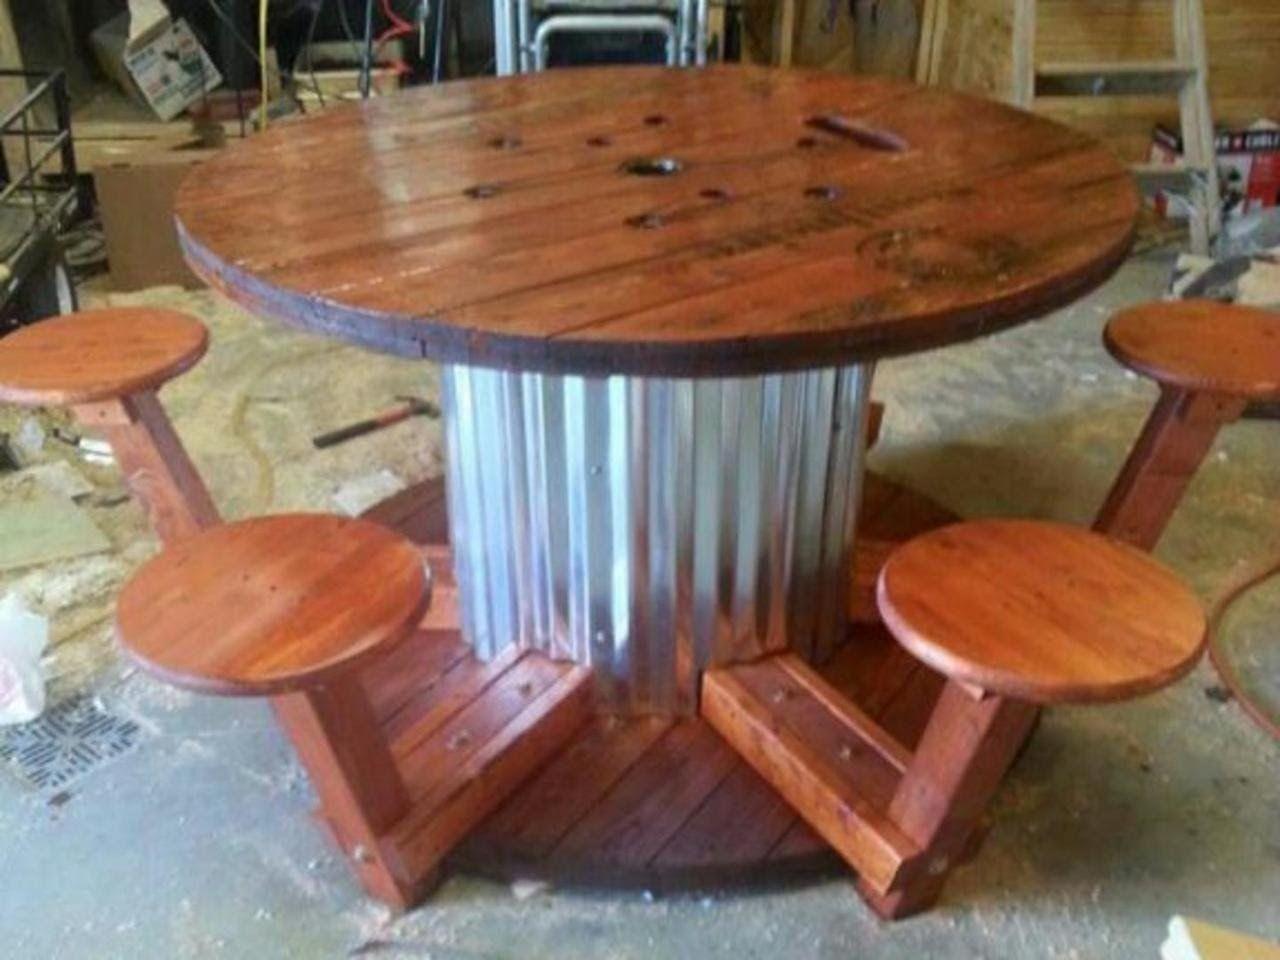 Wire Spool Table | Projects to try | Pinterest | Kabeltrommel, Möbel ...